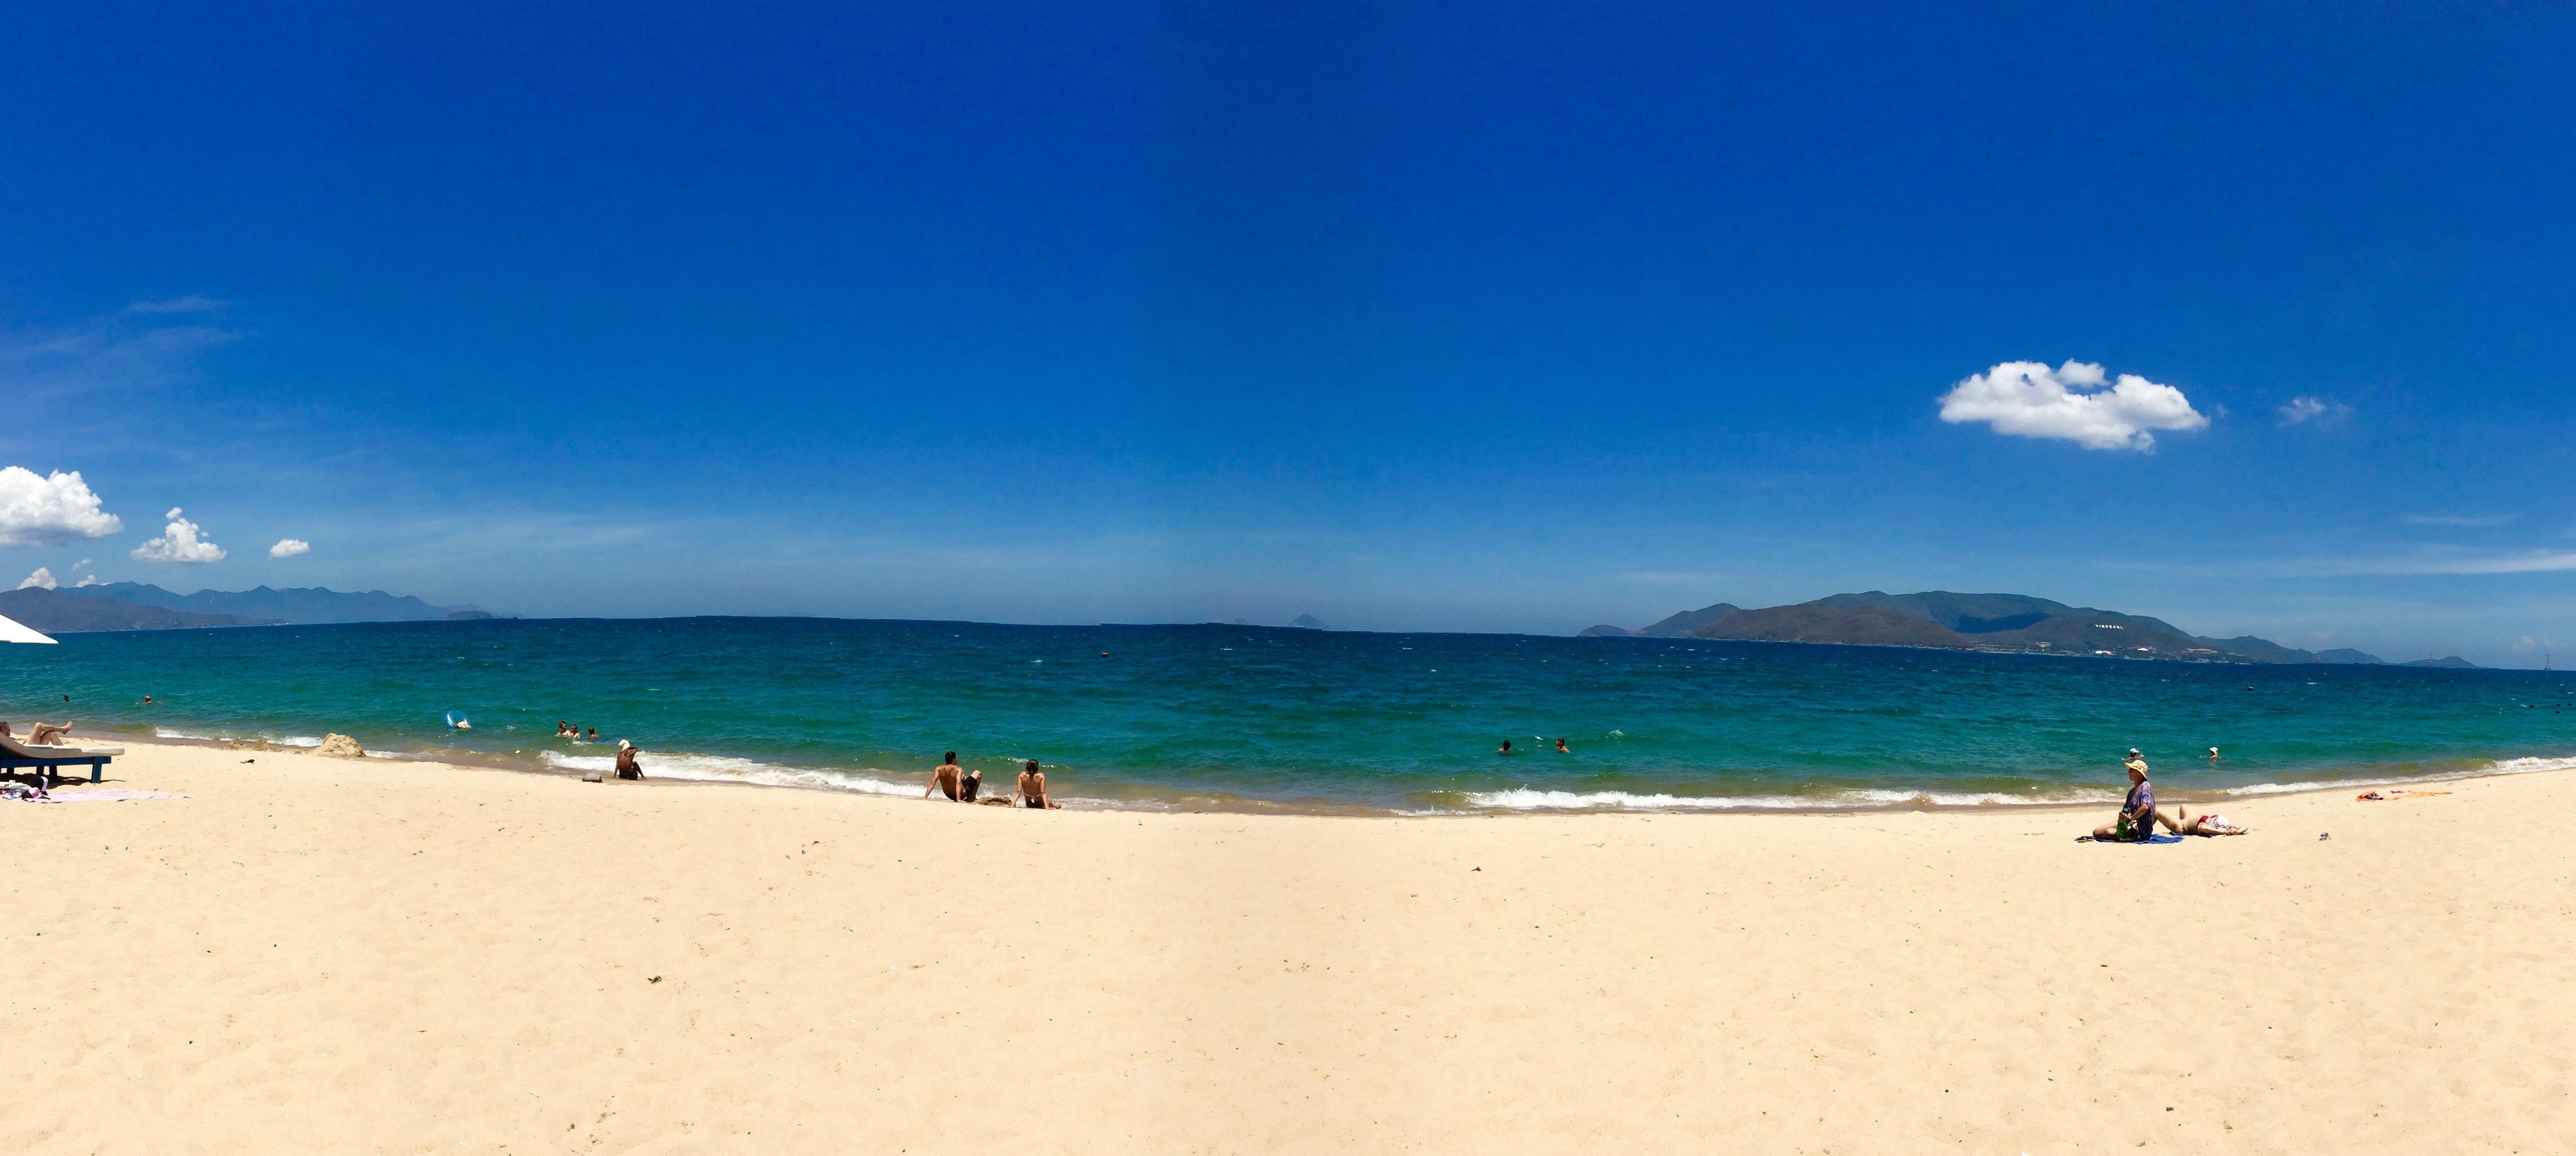 A panoramic view of Nha Trang Beach